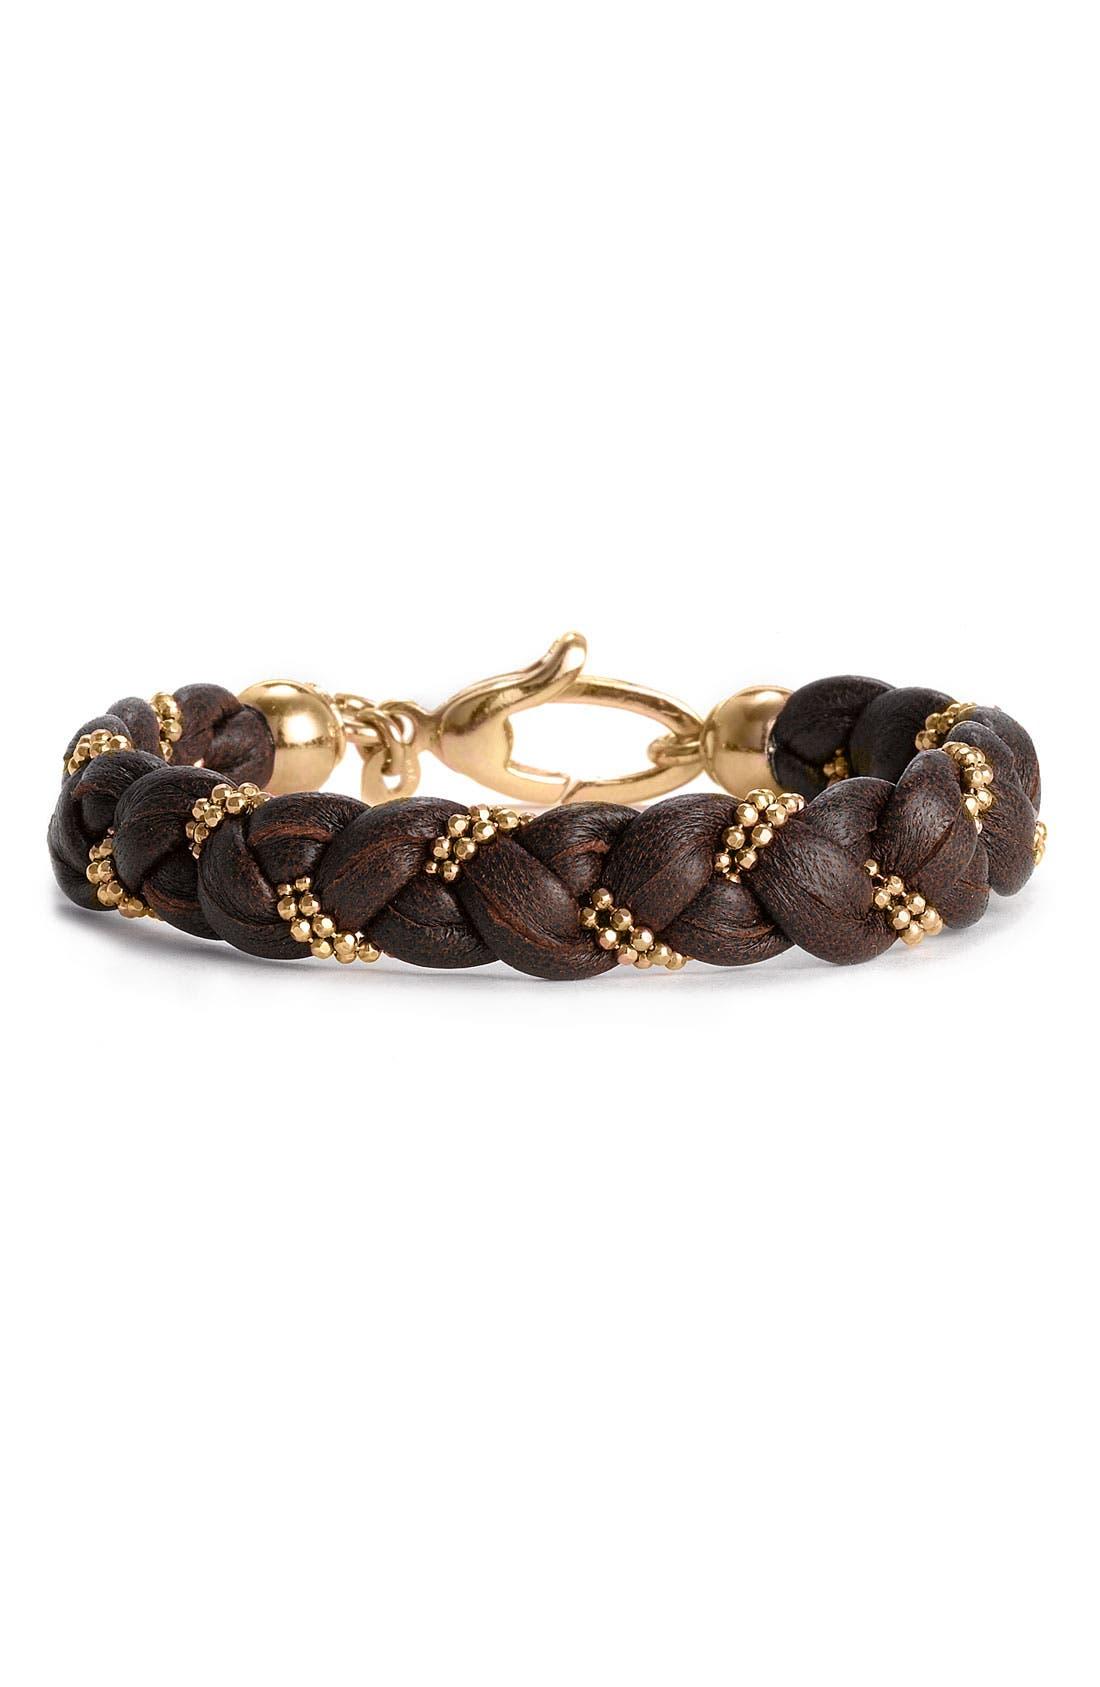 Alternate Image 1 Selected - Argento Vivo Braided Leather Bracelet